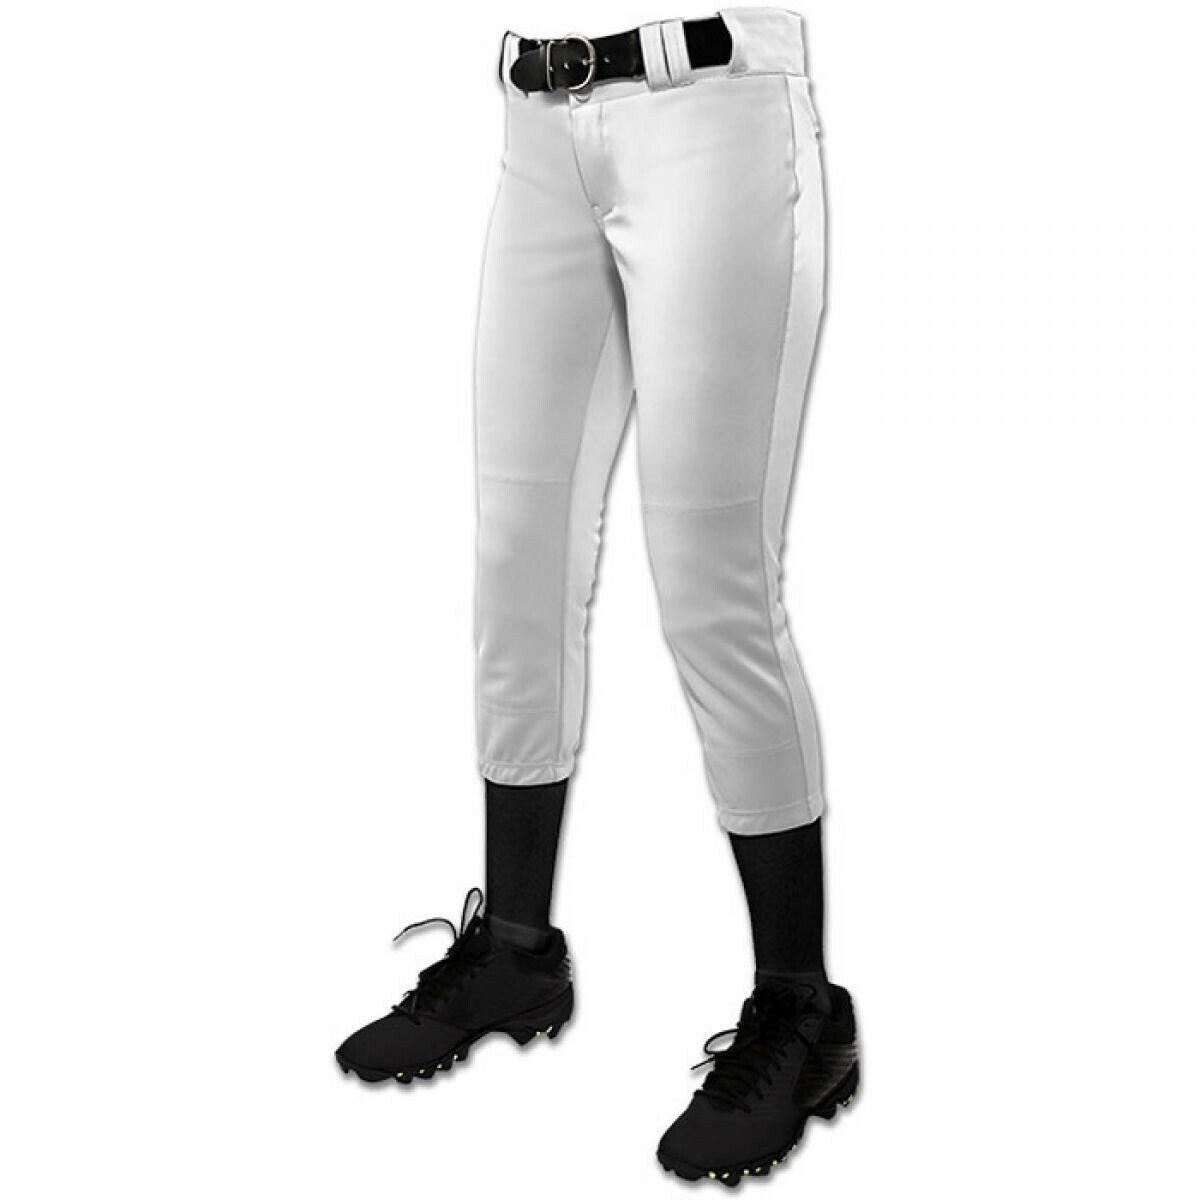 Champro Sports WOMEN/'S Tournament Traditional Low-Rise Fastpitch Softball Pants